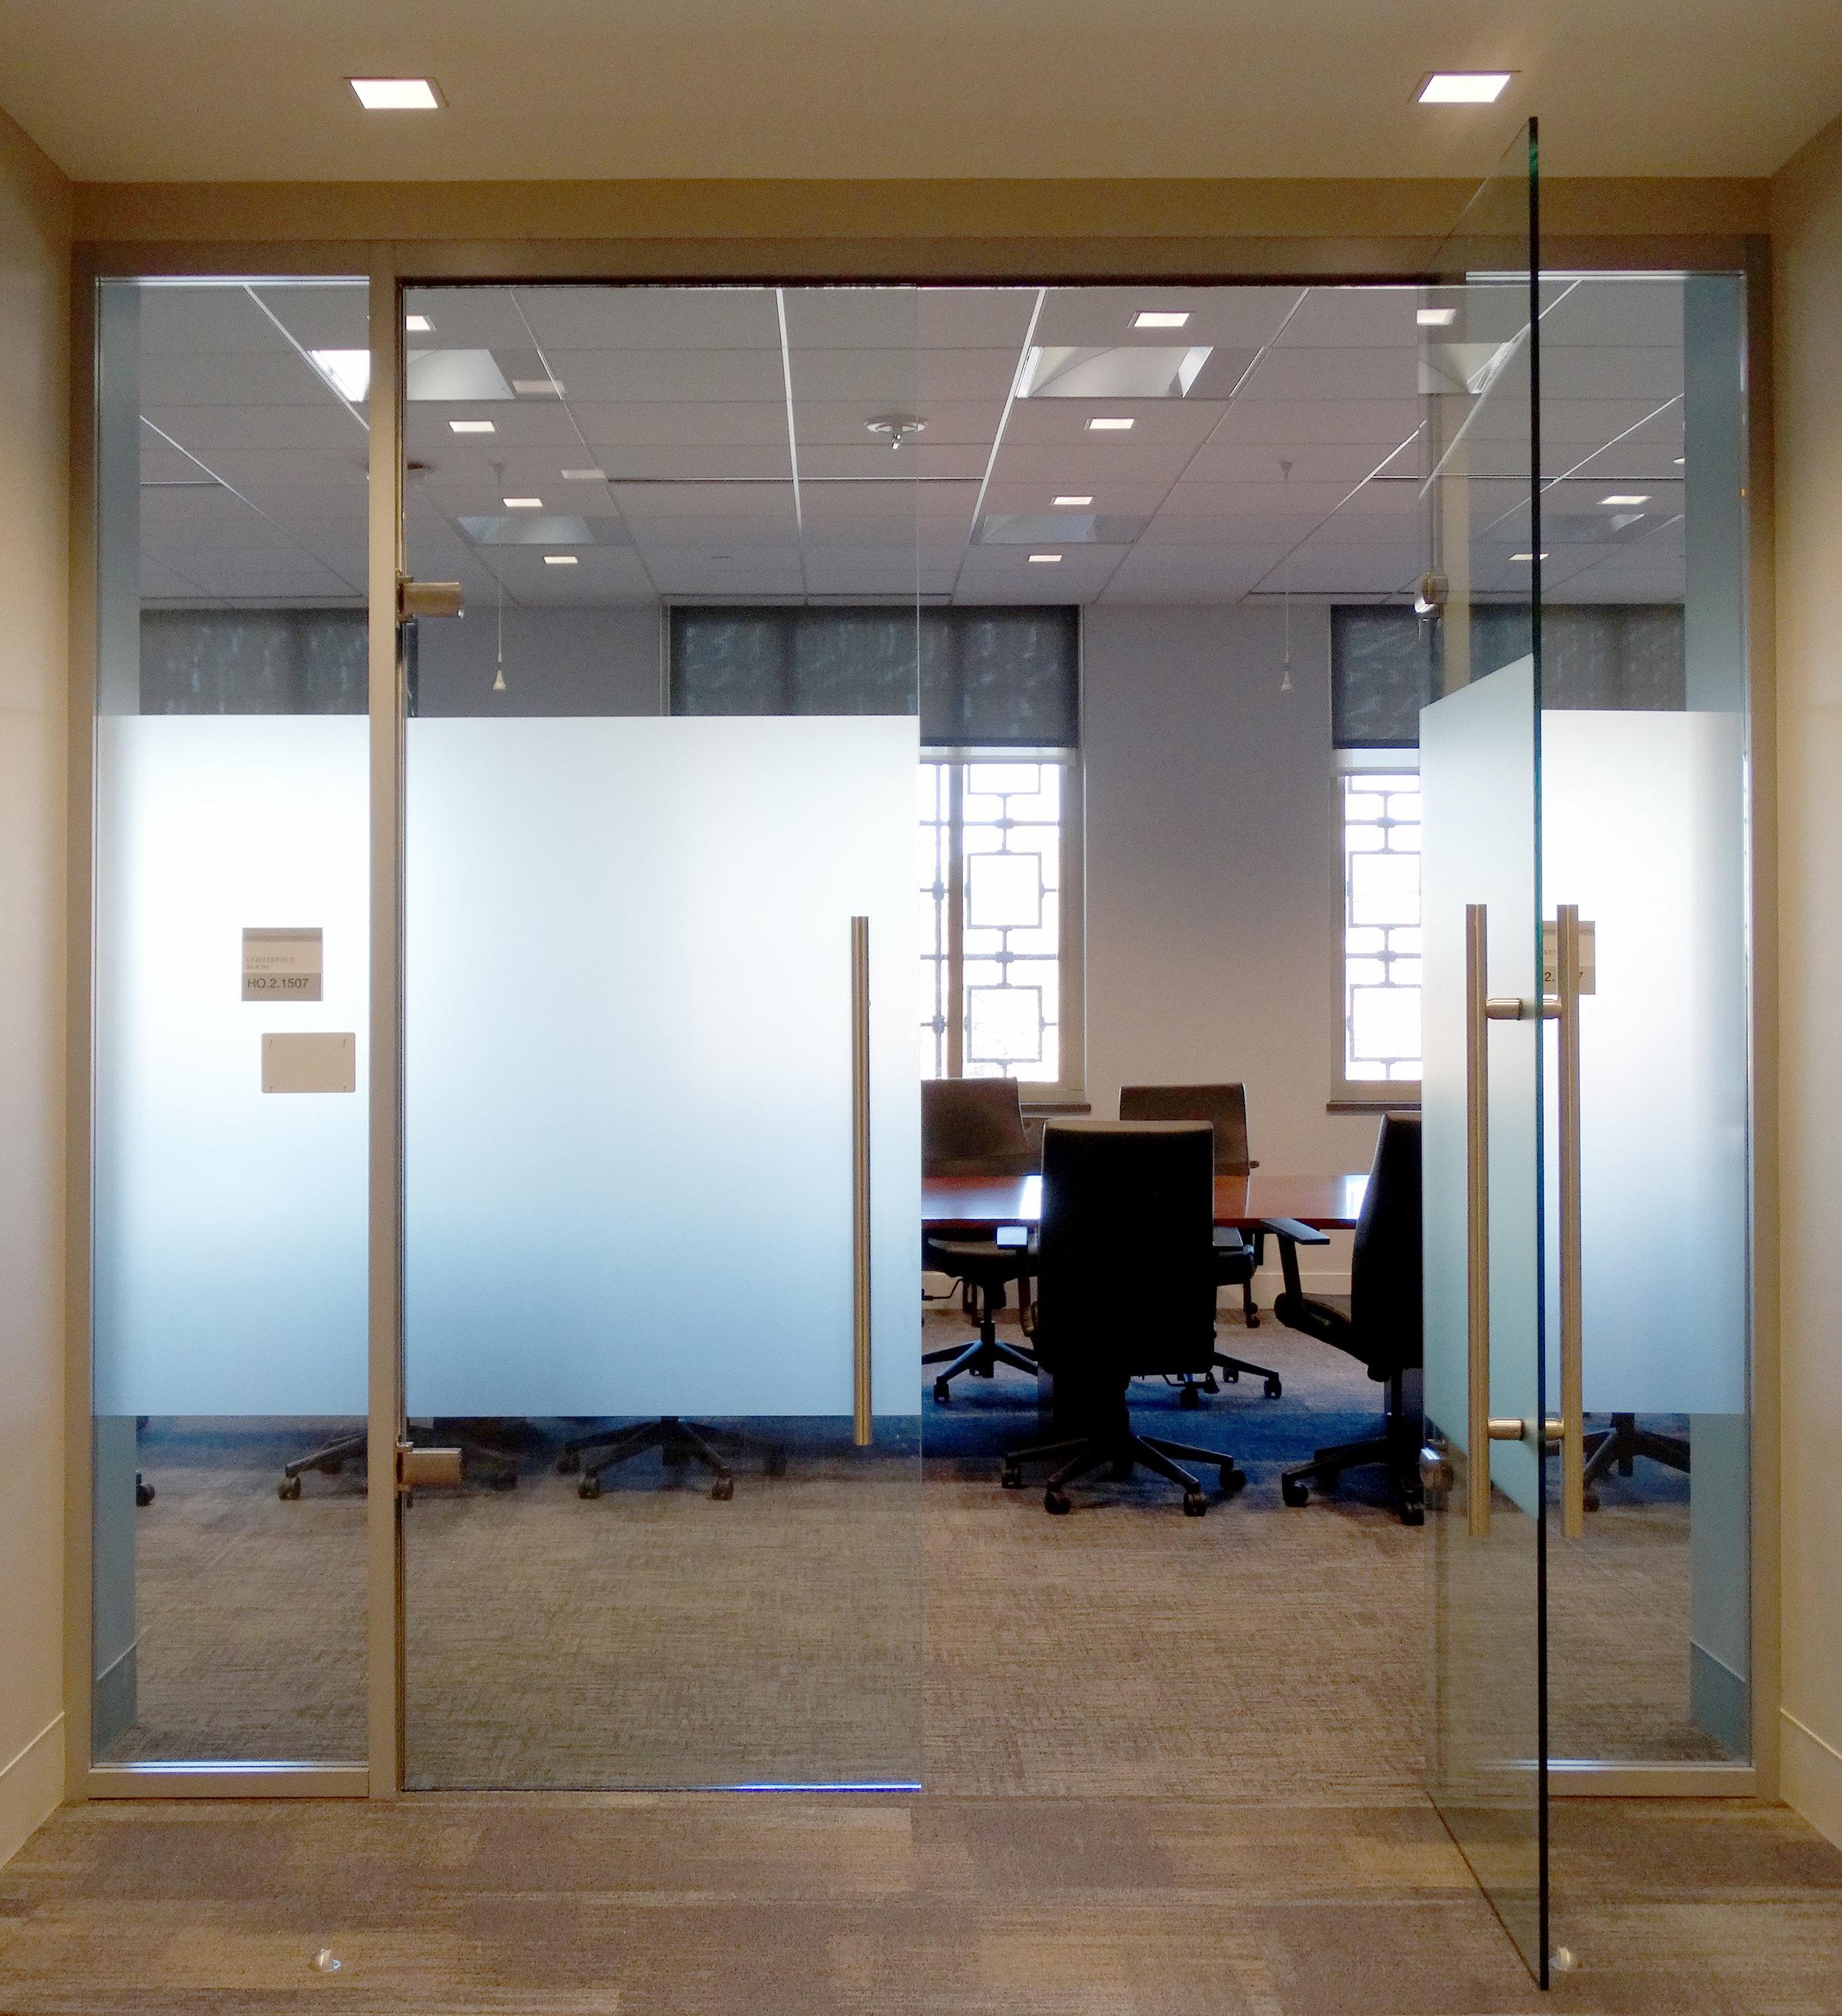 Litespace Frameless Glass Hydraulic Hinge Double Door - Spaceworks AI.jpg